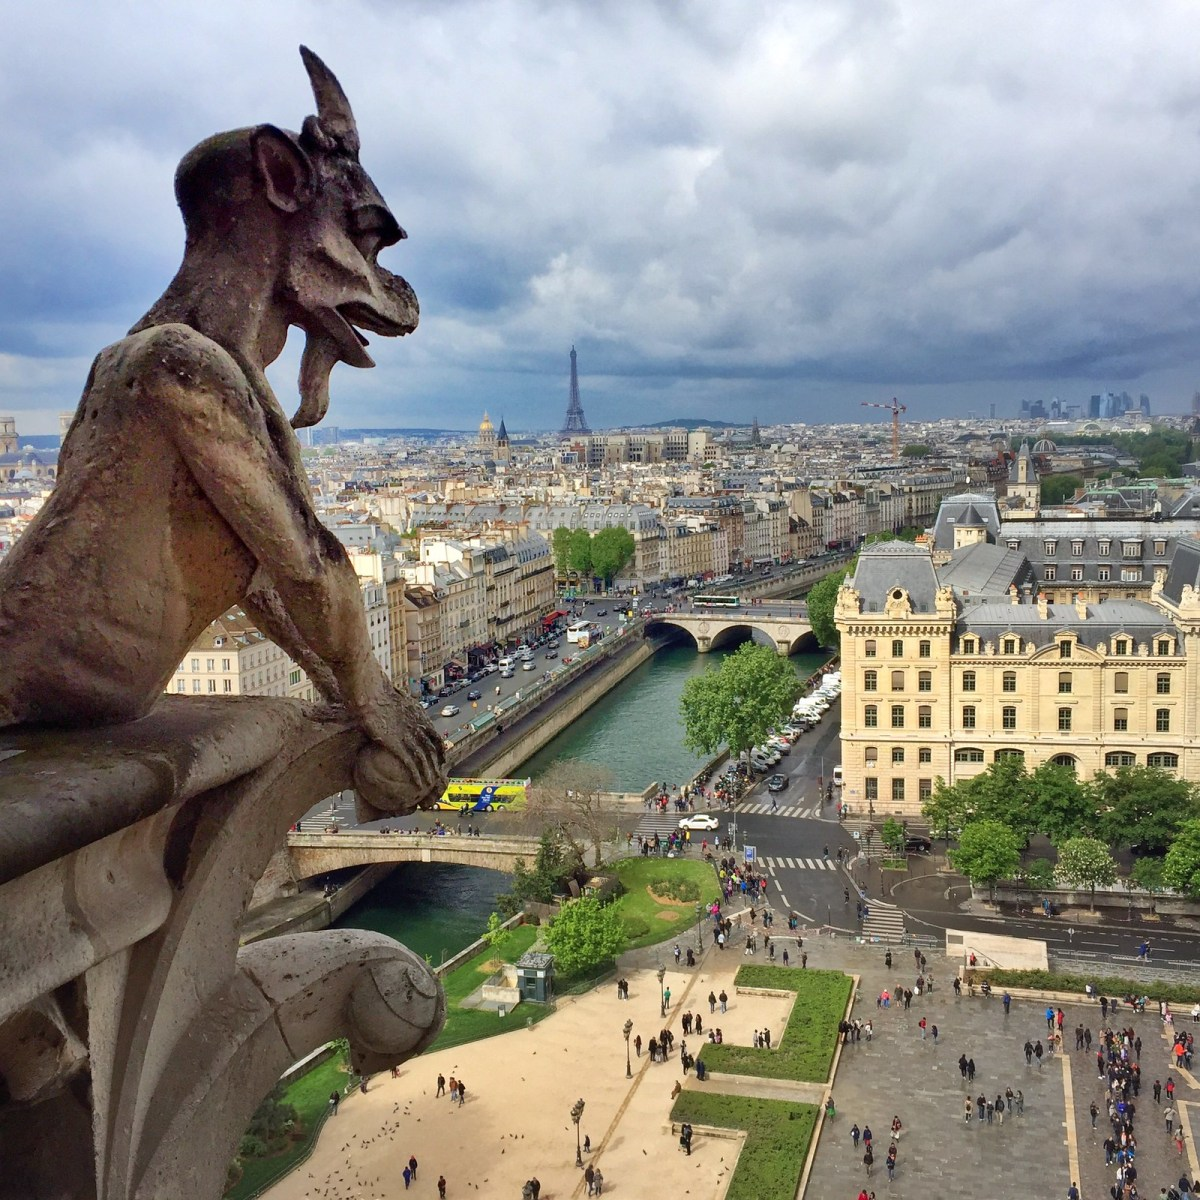 Viajar a Paris con Perro viajar a paris con perro Viajar a Paris con perro 34215580300 07930bcf87 h